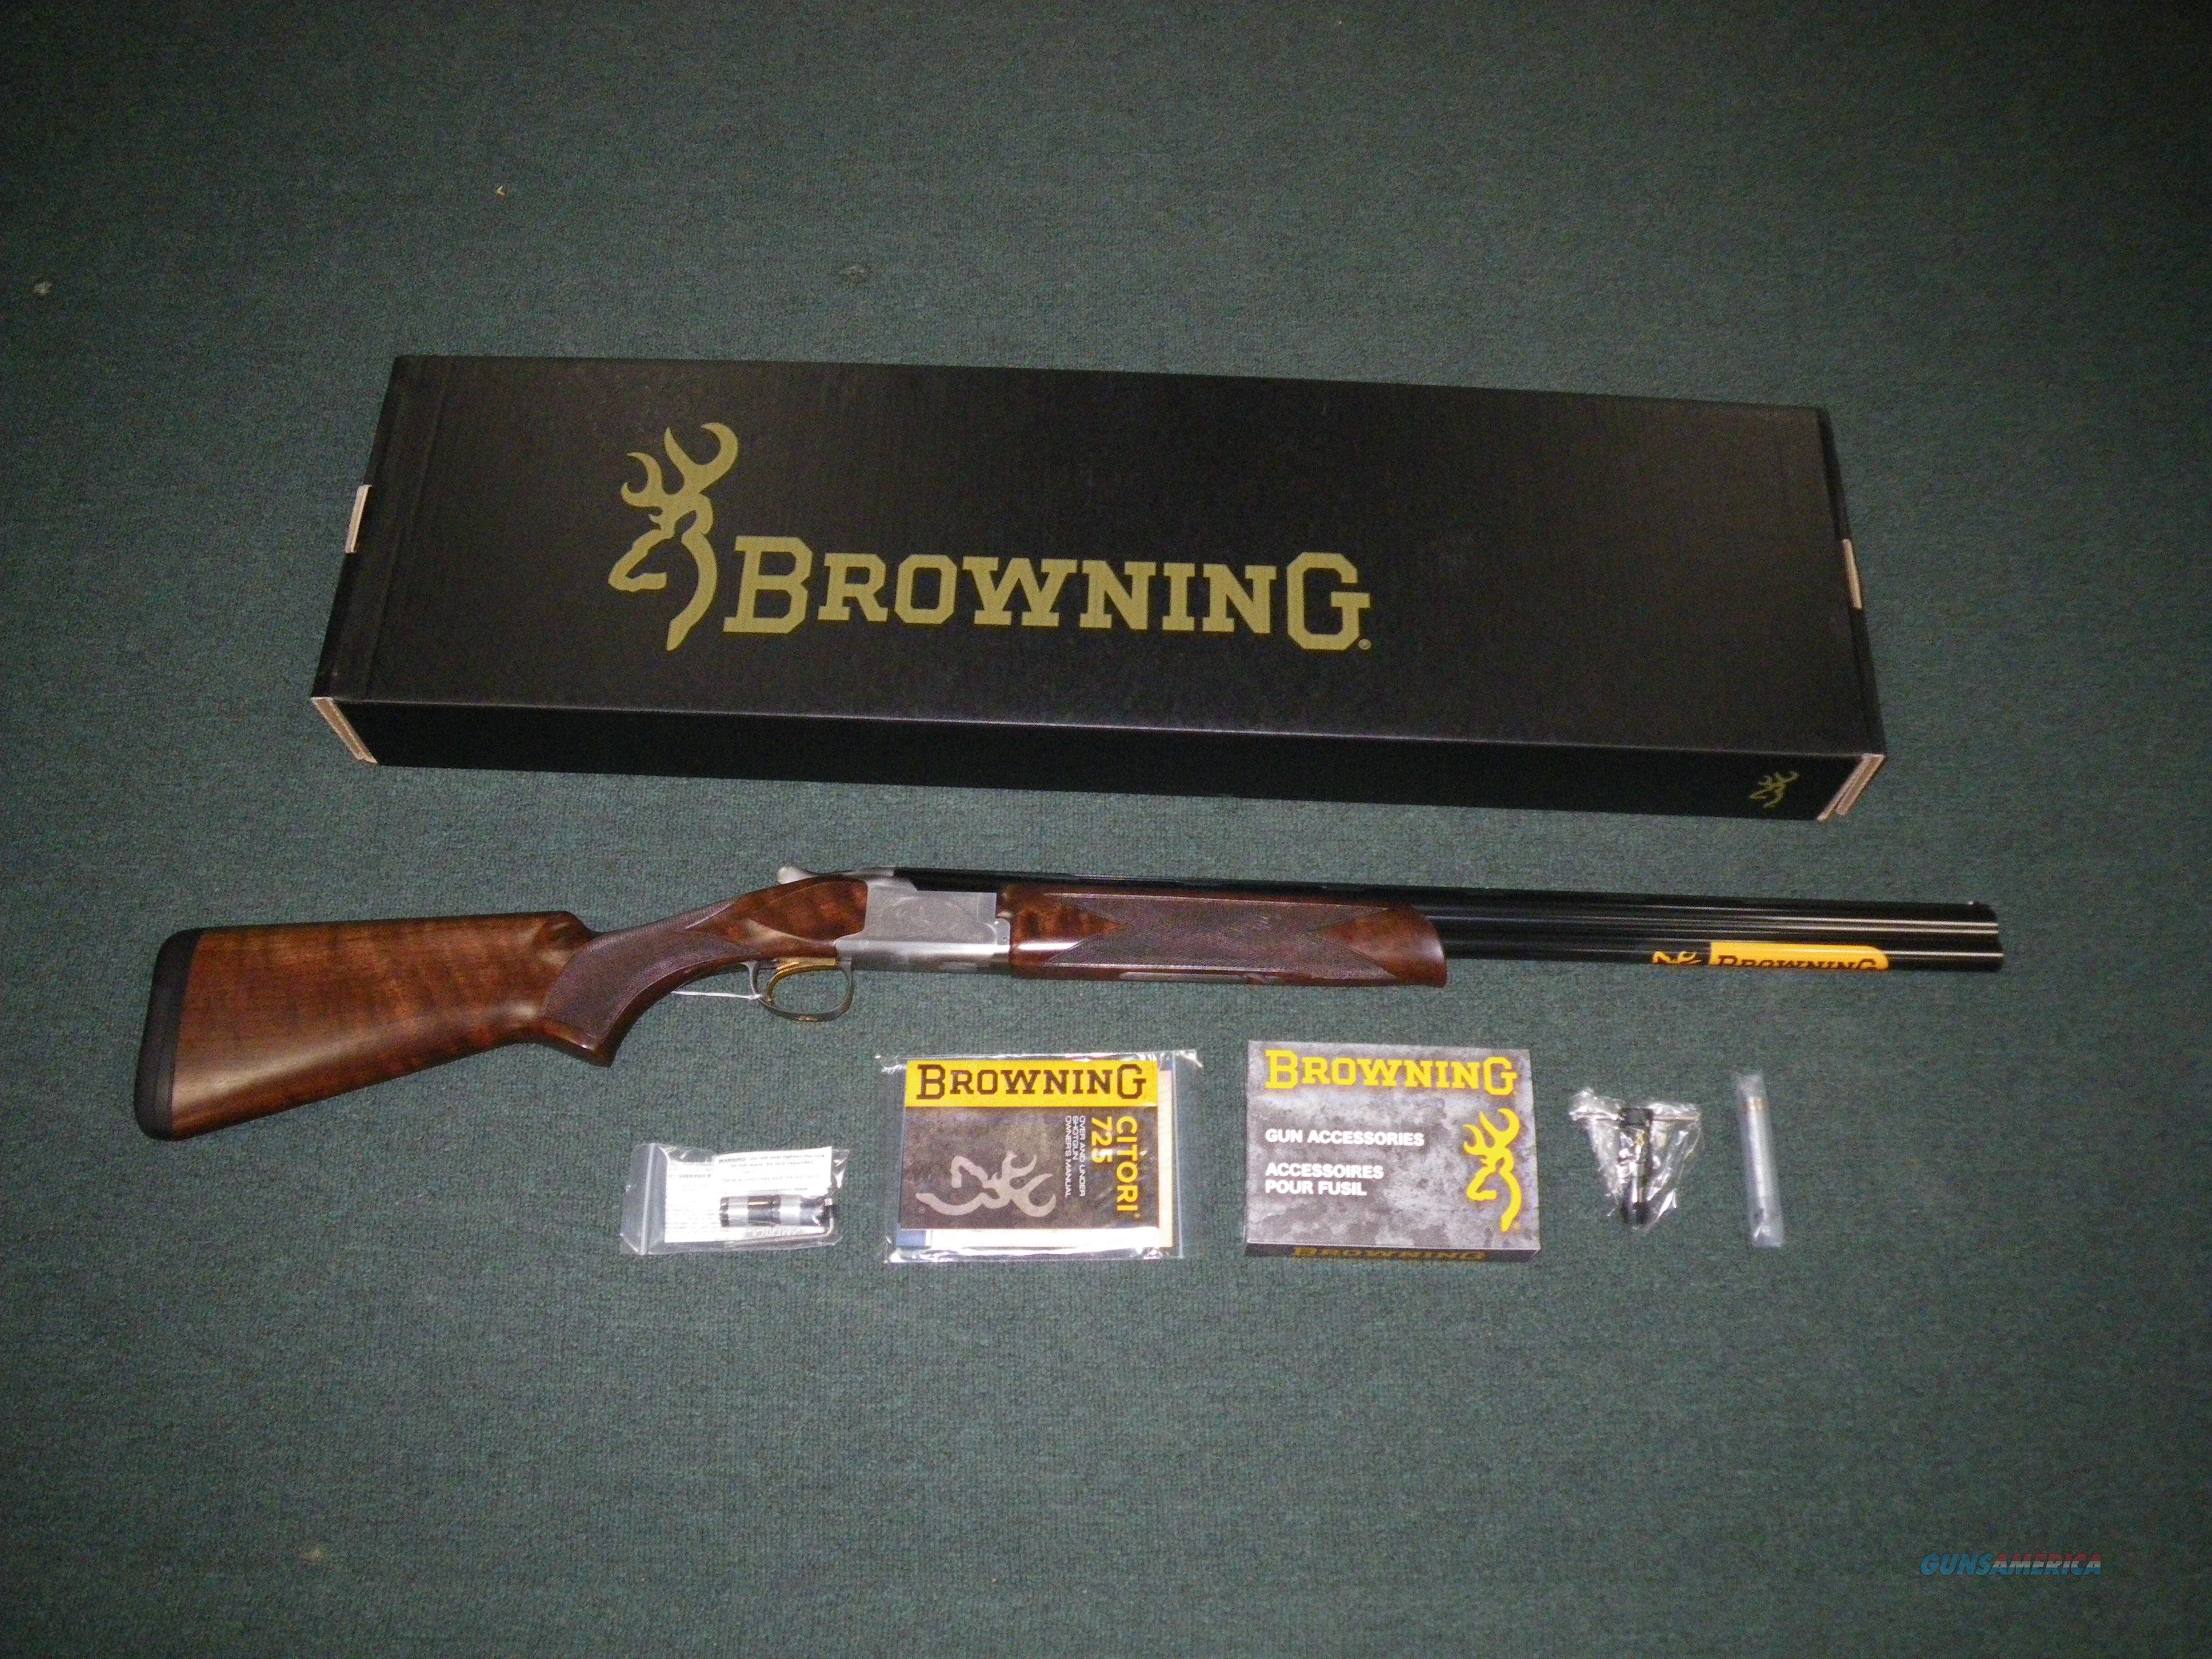 "Browning Citori 725 Field 12ga 26"" 3"" Chamber 0135303005  Guns > Shotguns > Winchester Shotguns - Modern > O/U > Hunting"